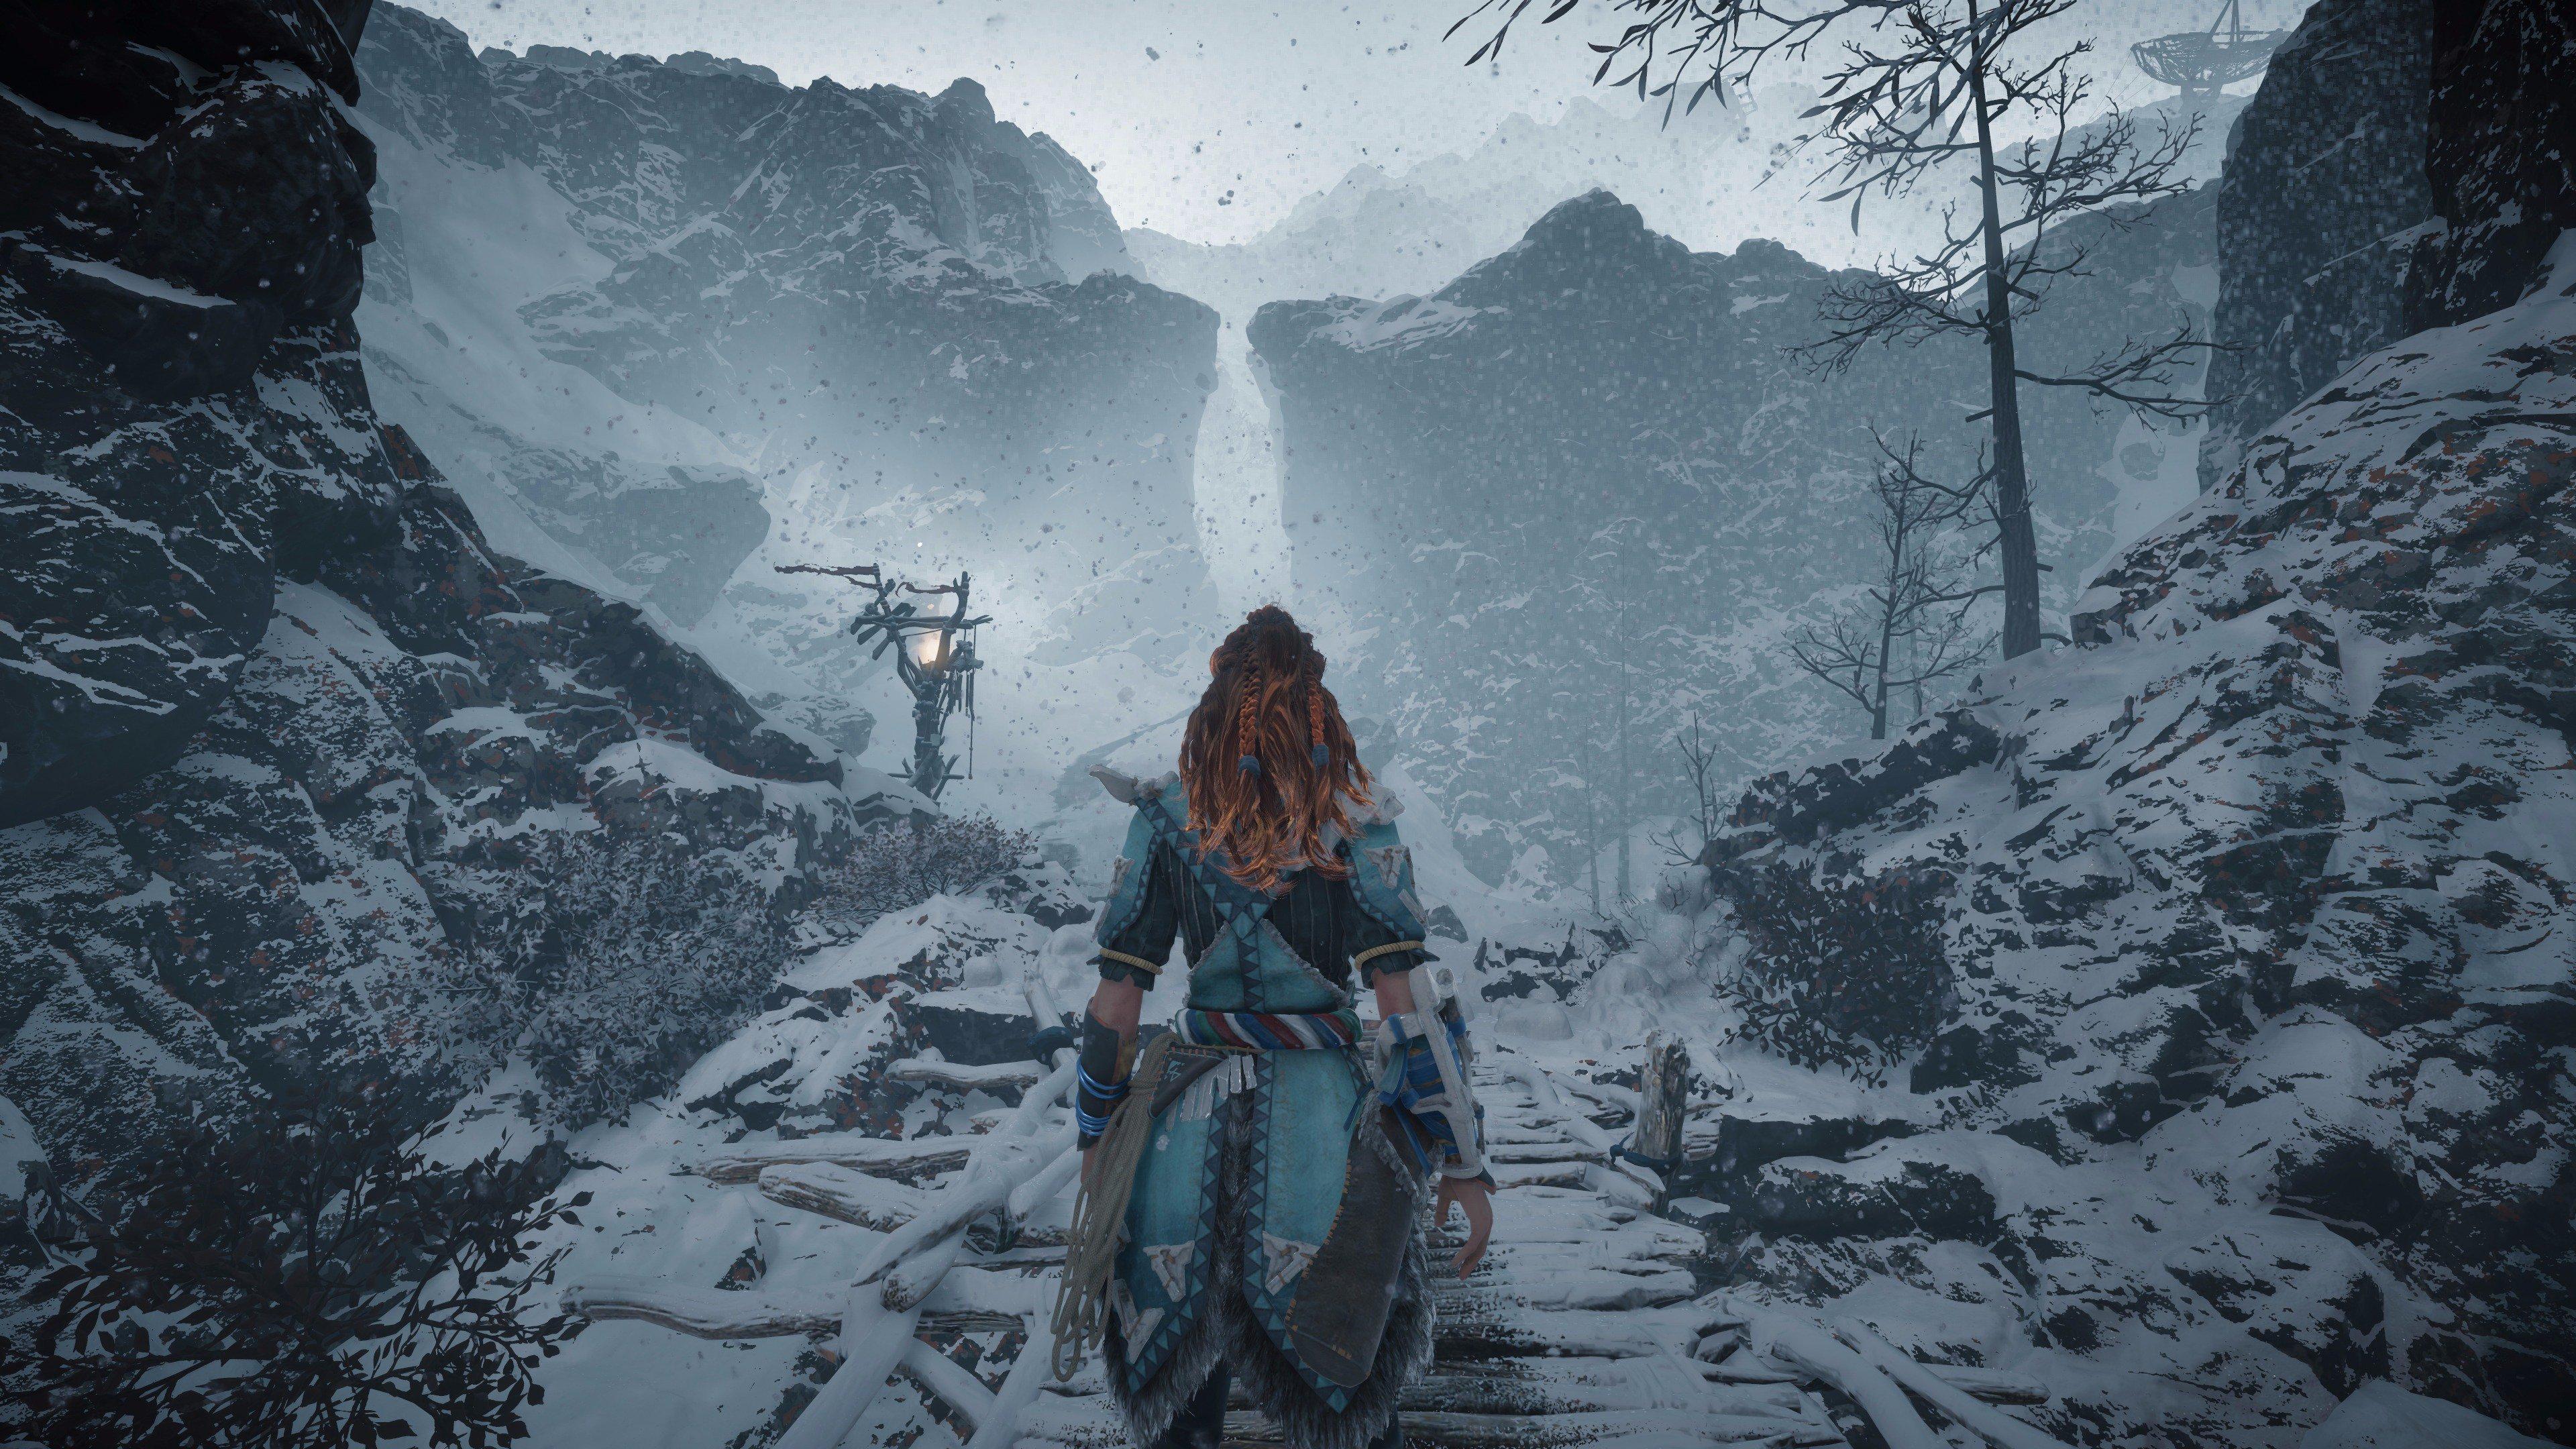 Aloy Horizon Zero Dawn 4k Hd Games 4k Wallpapers Images